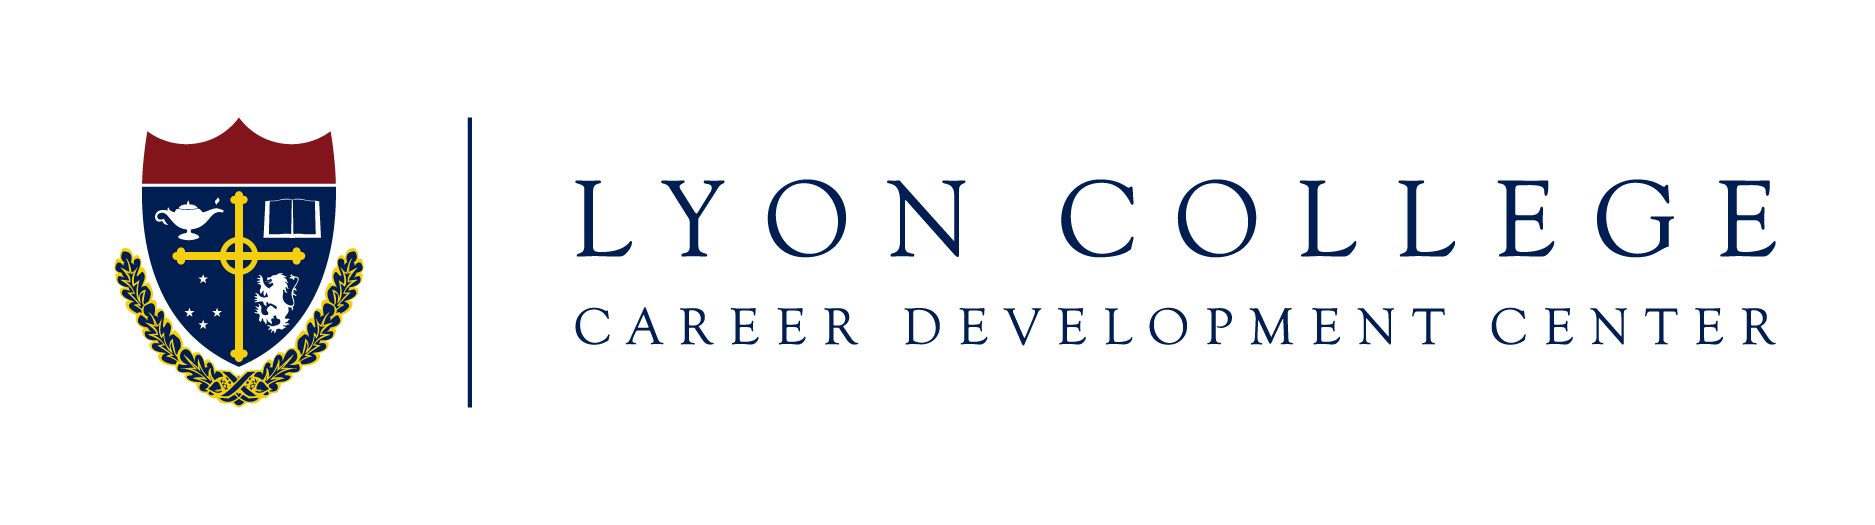 career development center college career development center